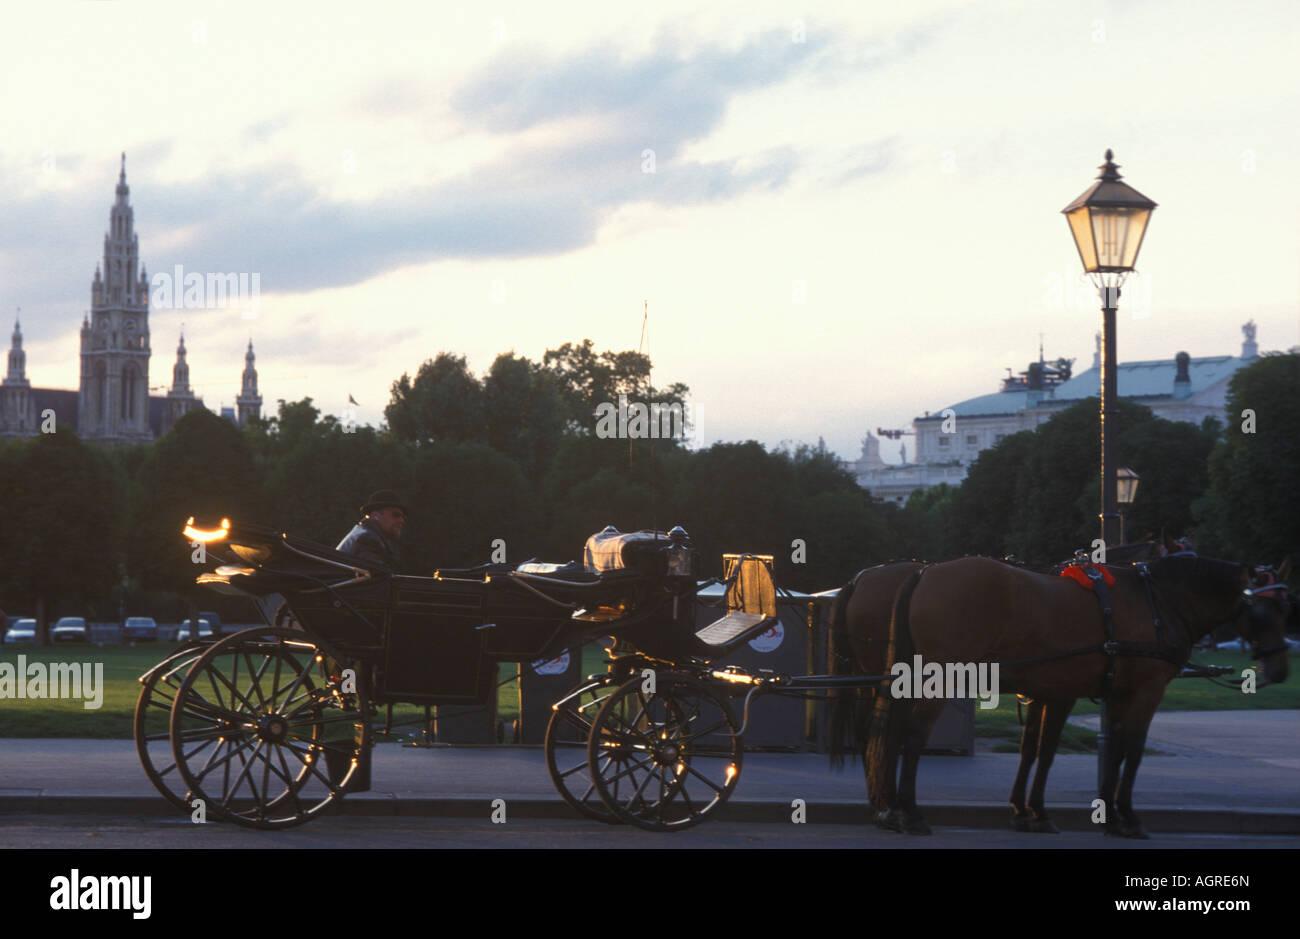 Waitung hackney carriage at Heldenplatz place in Vienna Austria - Stock Image